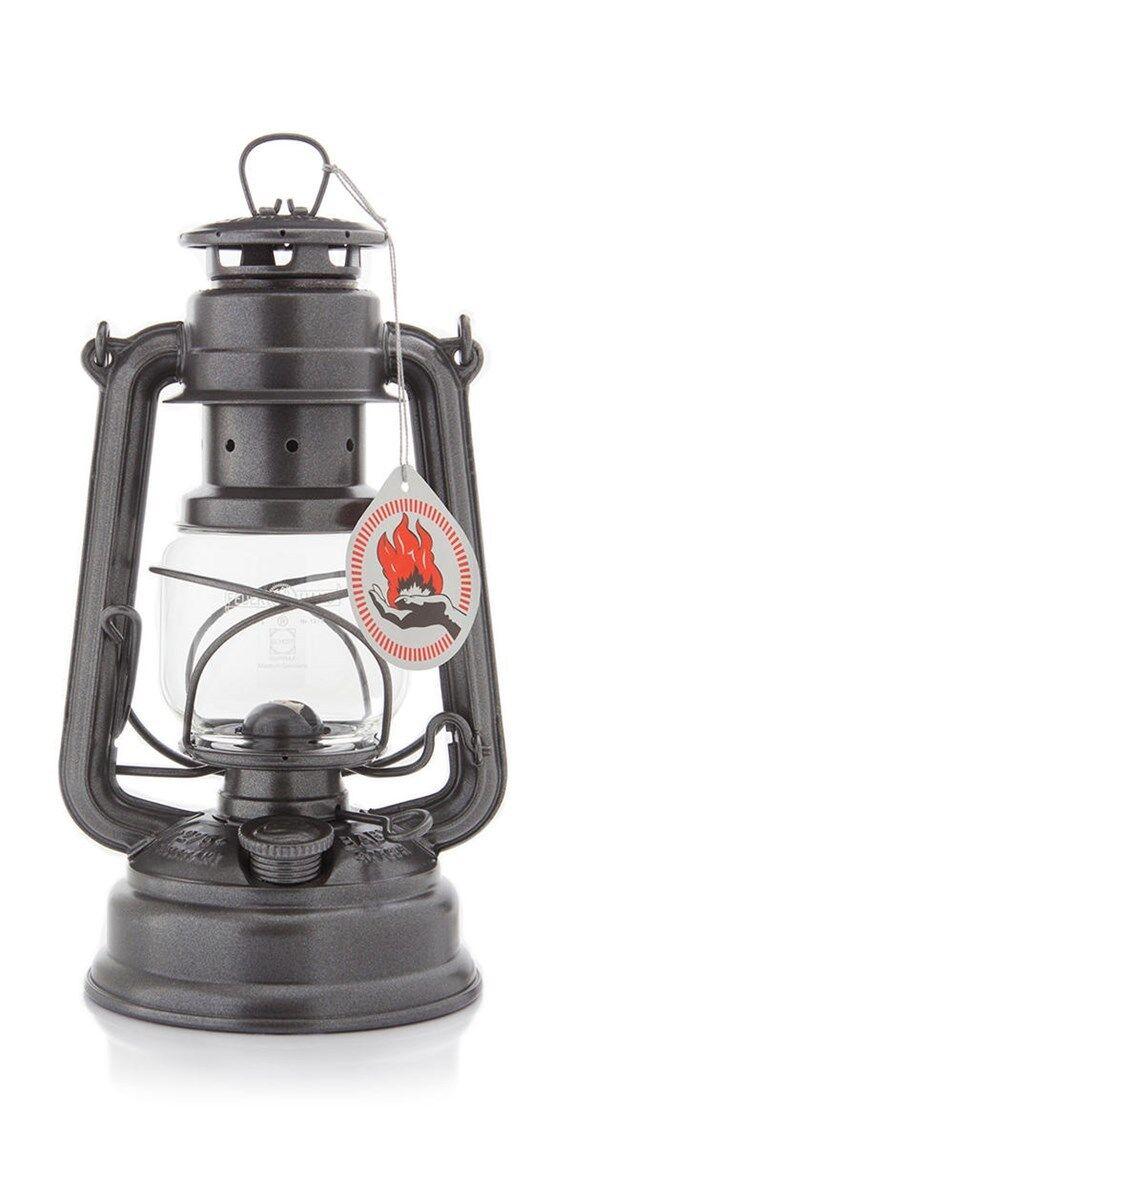 Sparkling Iron Feuerhand Hurricane Lantern Storm Lamp Camping Lamp Paraffin Lamp